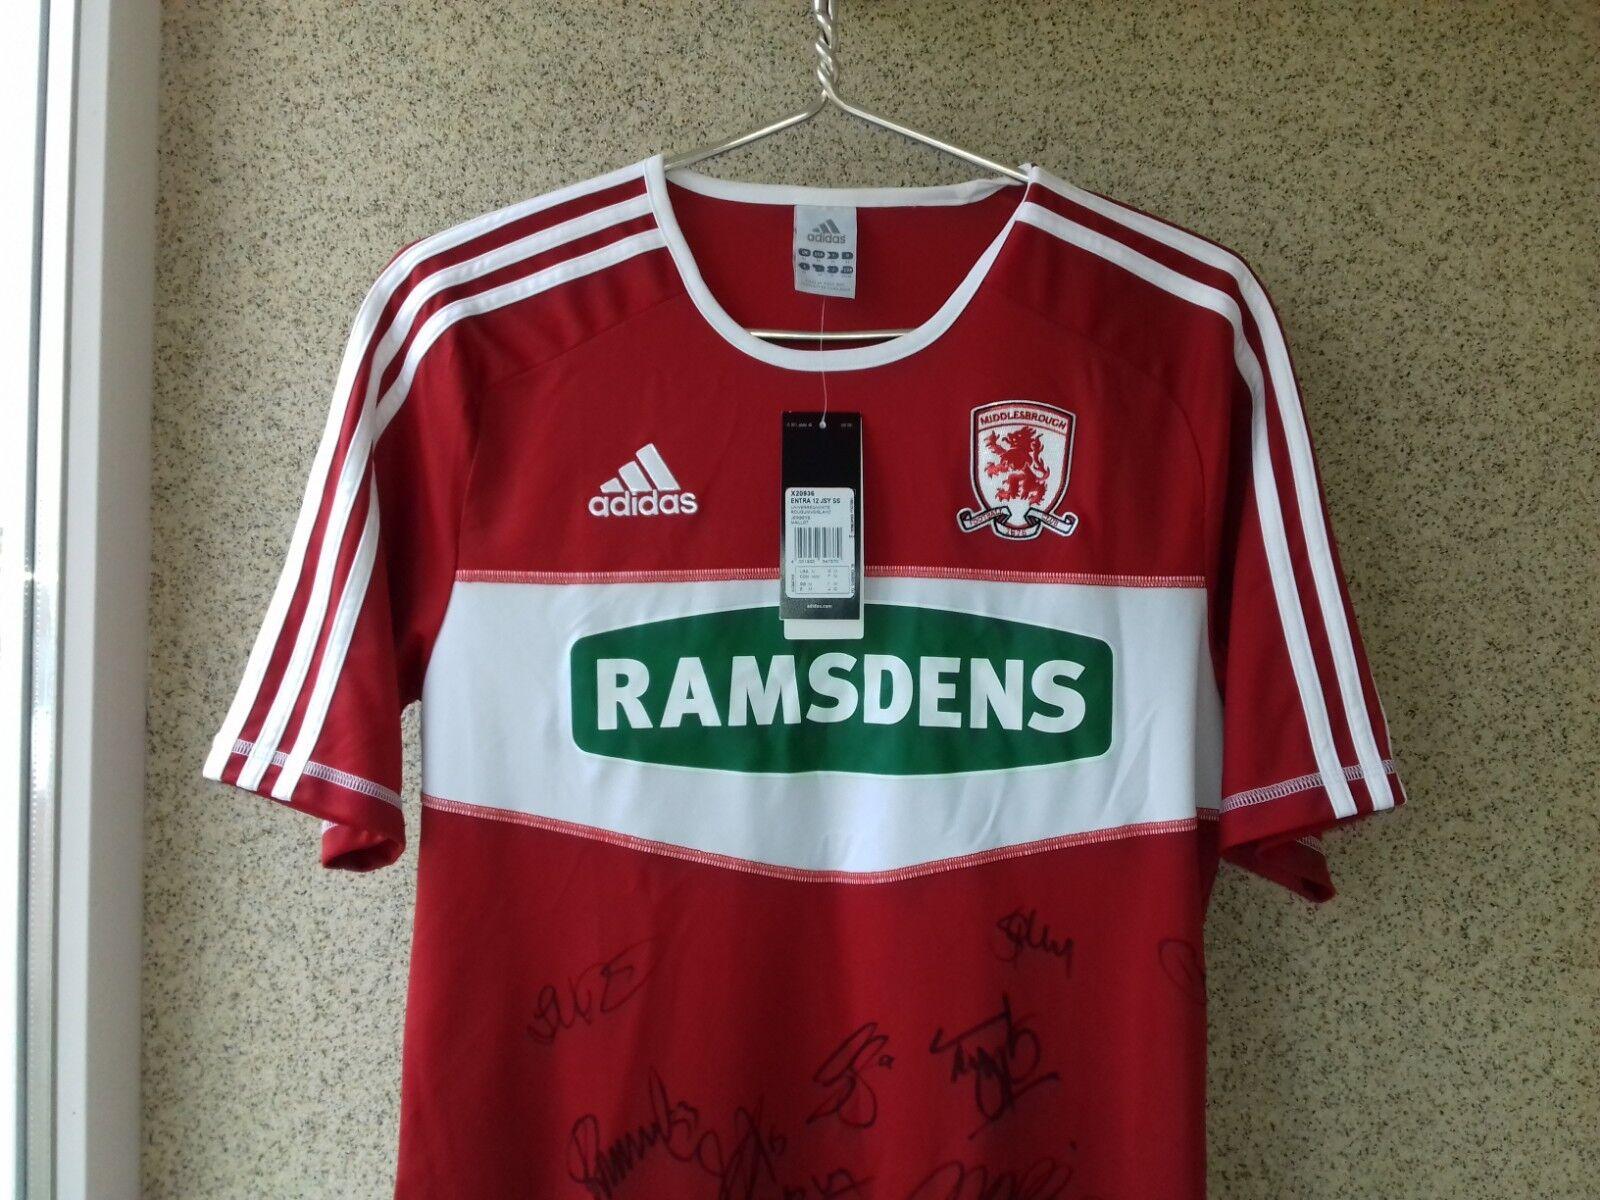 Middlesbrough firmado Hogar Hogar Hogar Camiseta De Fútbol 2012 2013 Jersey M Fútbol Inglaterra eb812f